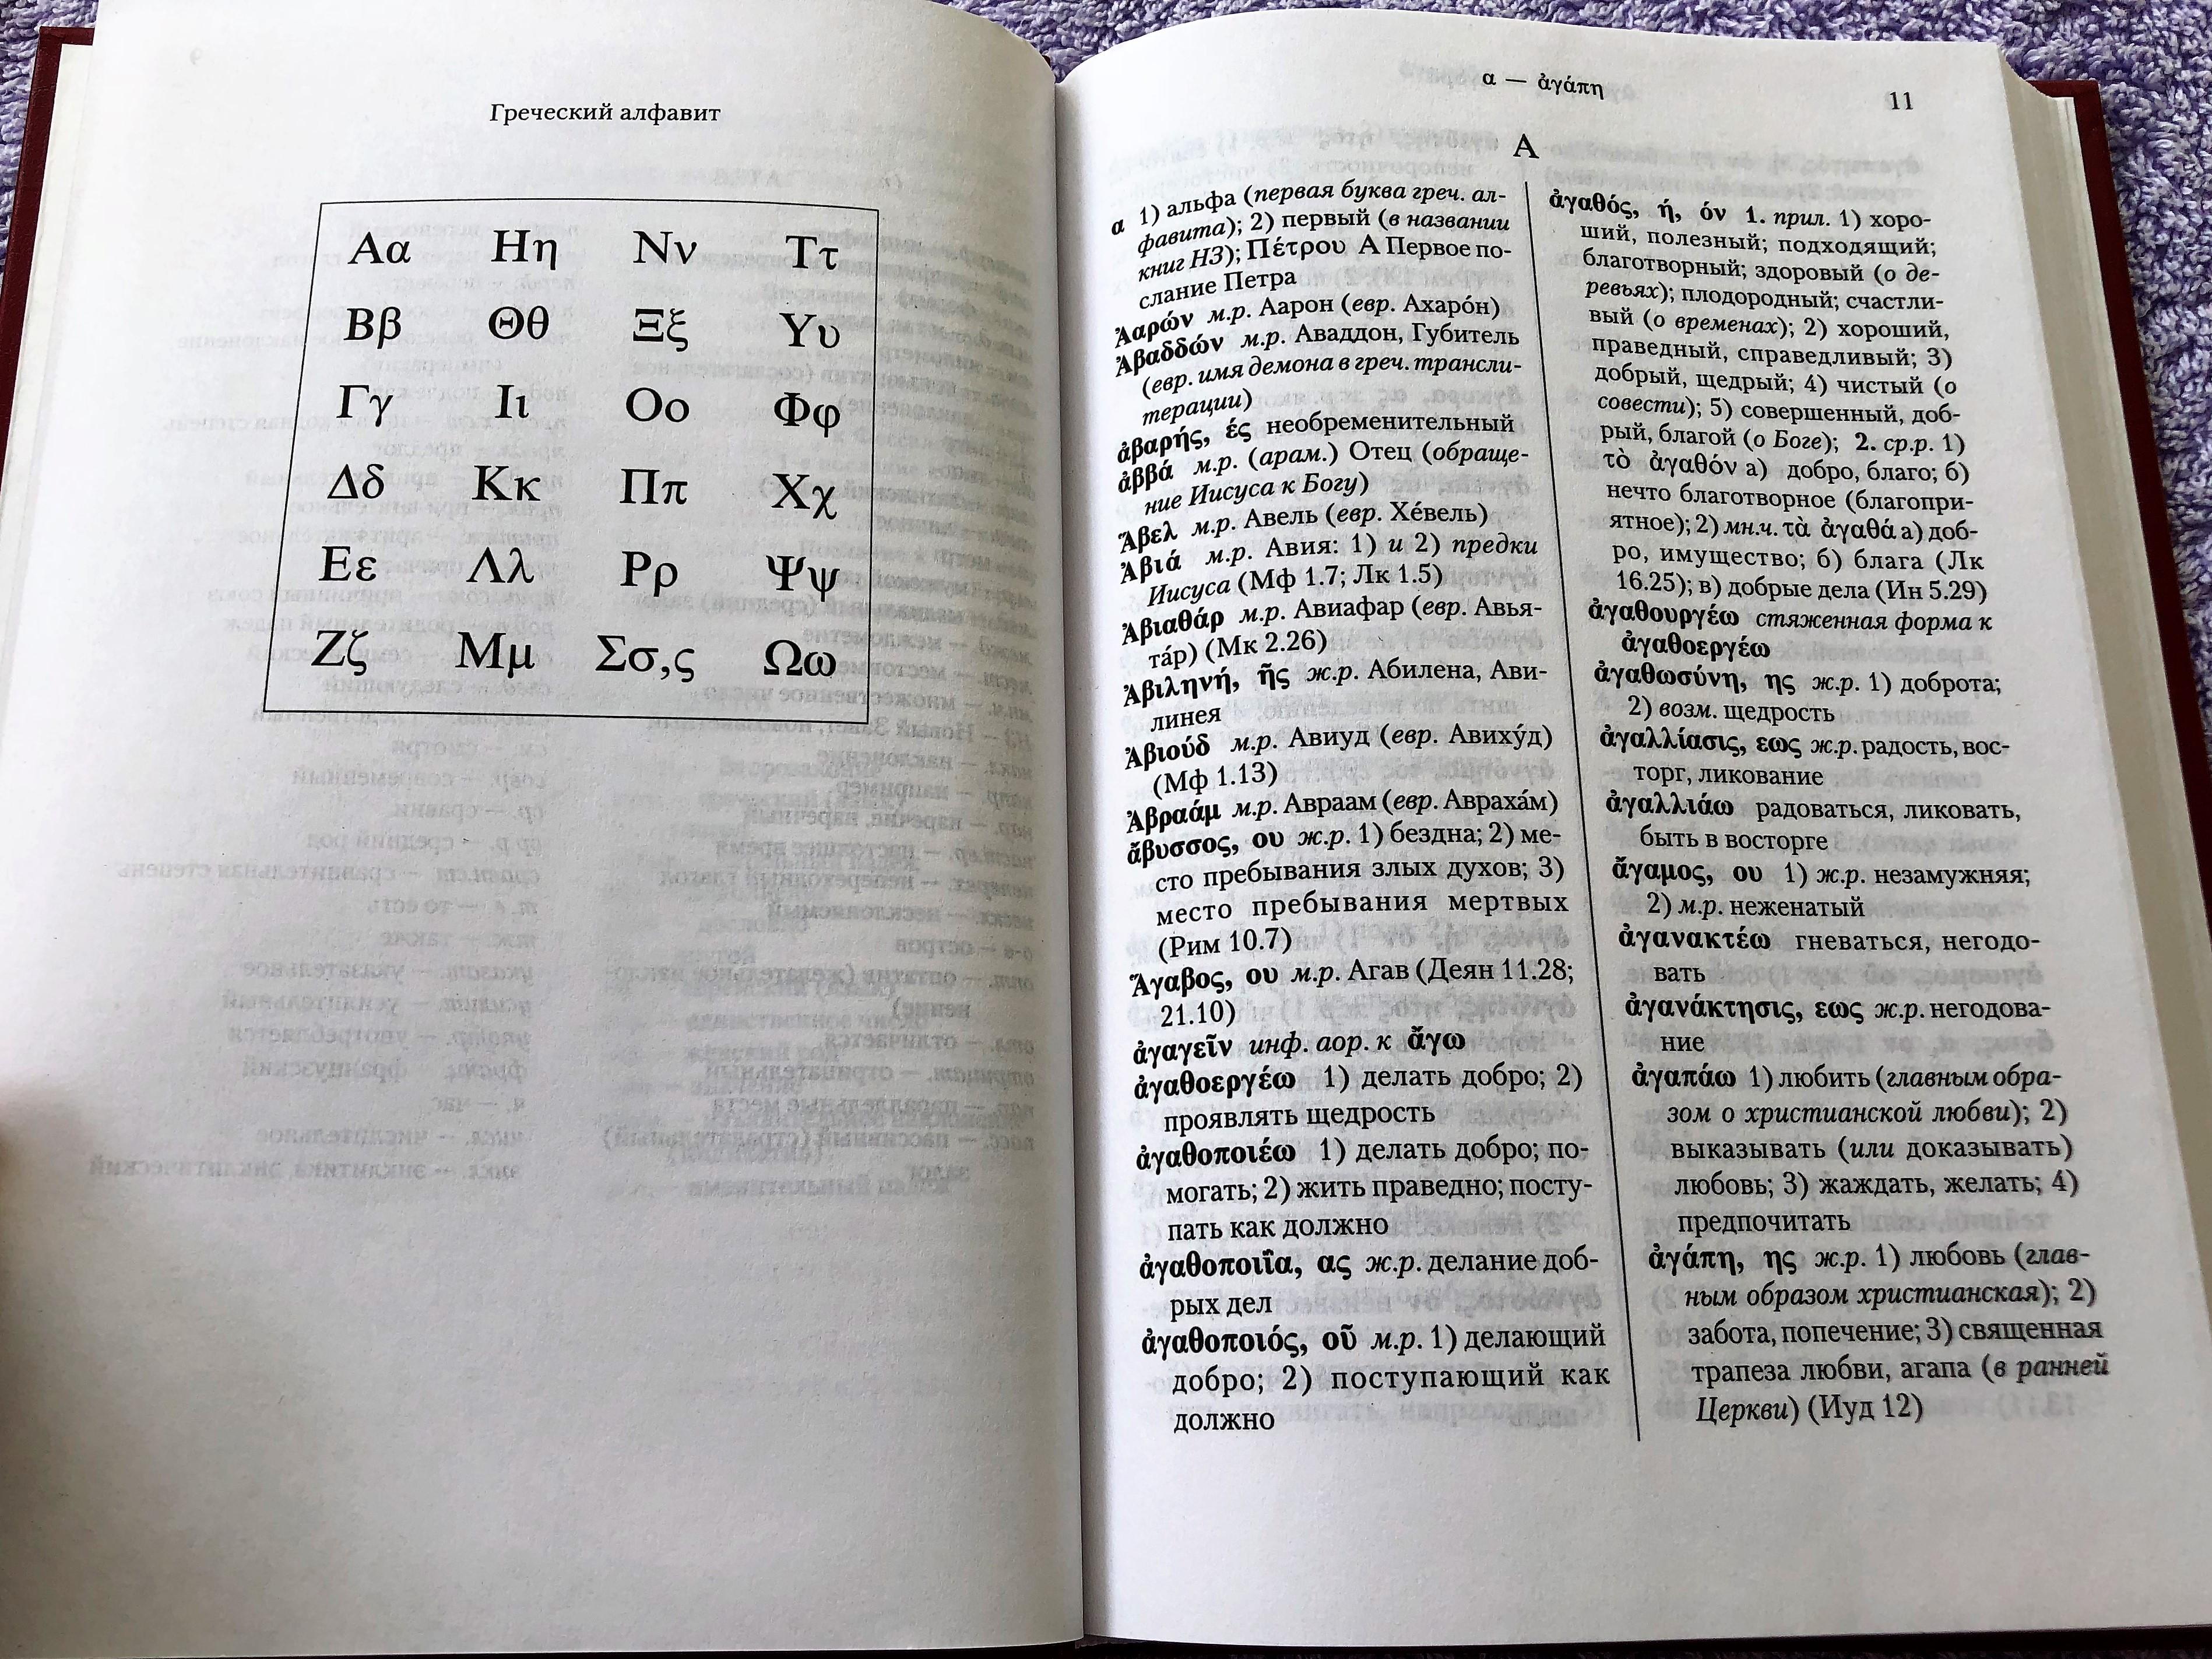 greek-russian-new-testament-dictionary-7-.jpg